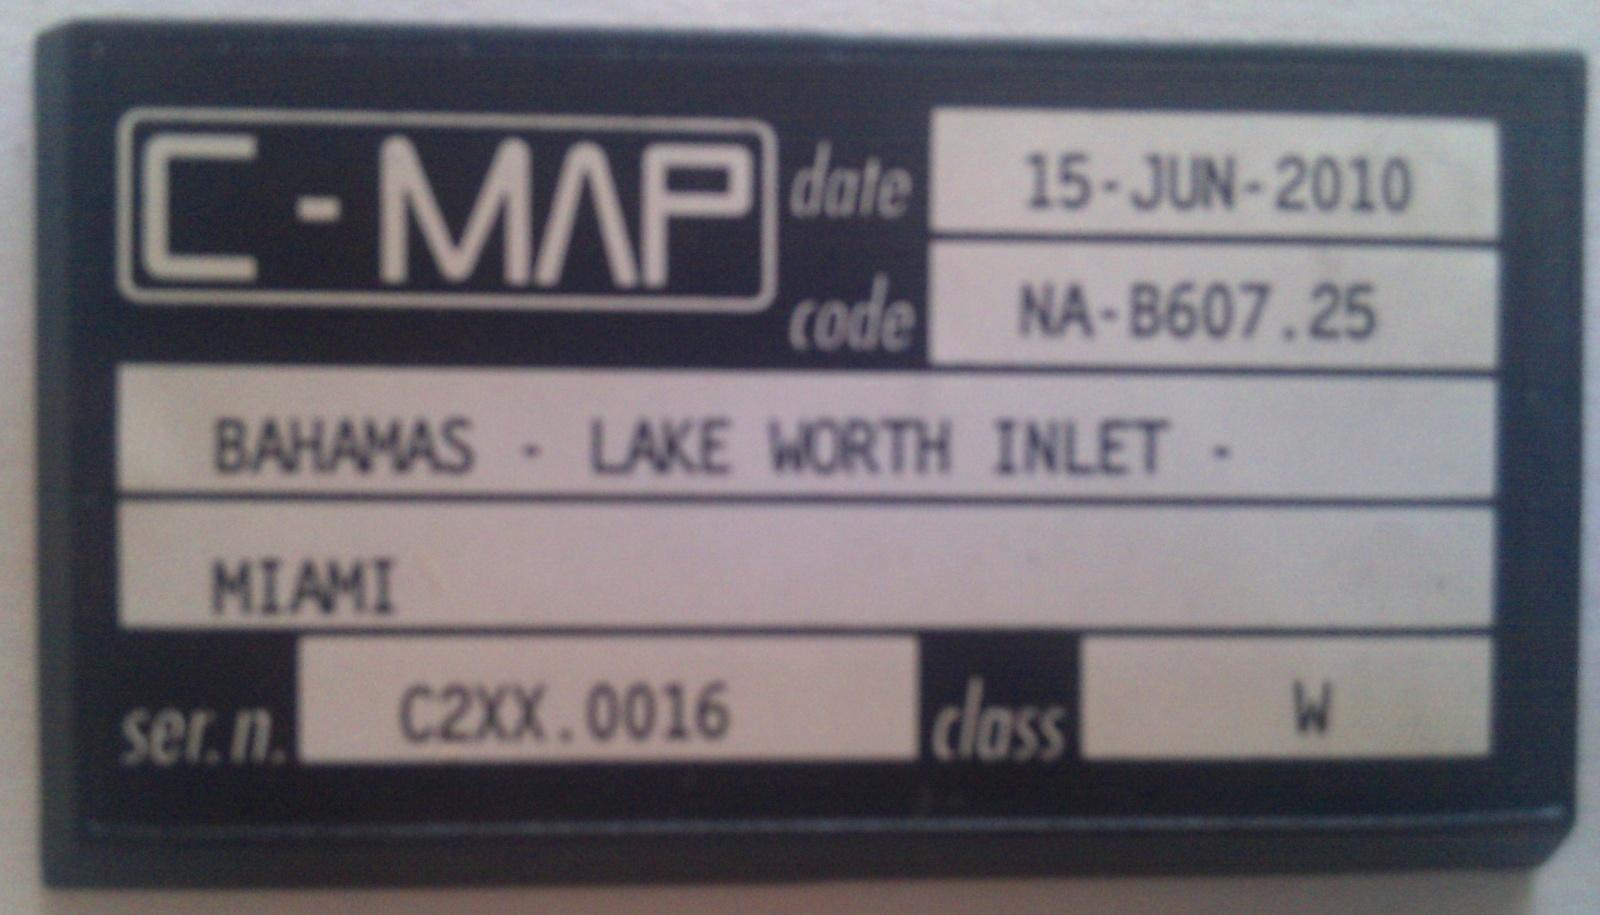 Click image for larger version  Name:C - Map Bahamas - Lake Worth Inlet - Miami.jpg Views:97 Size:345.5 KB ID:41391